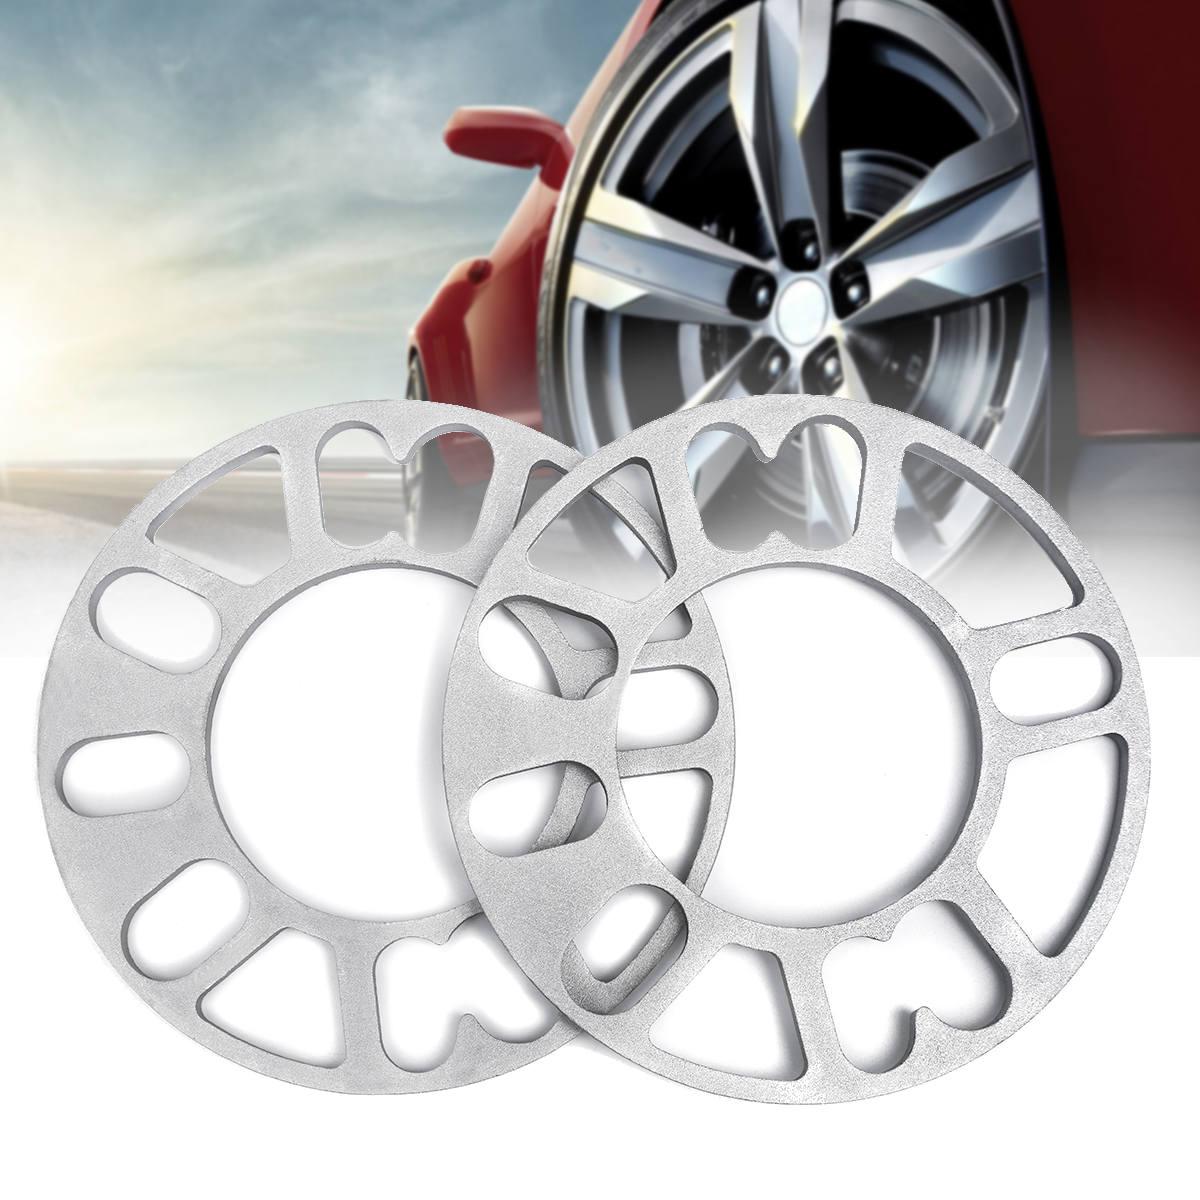 3 mm Wheel Spacers Universal Multi-Fit 4-studs /& 5-studs 2PCS Honda